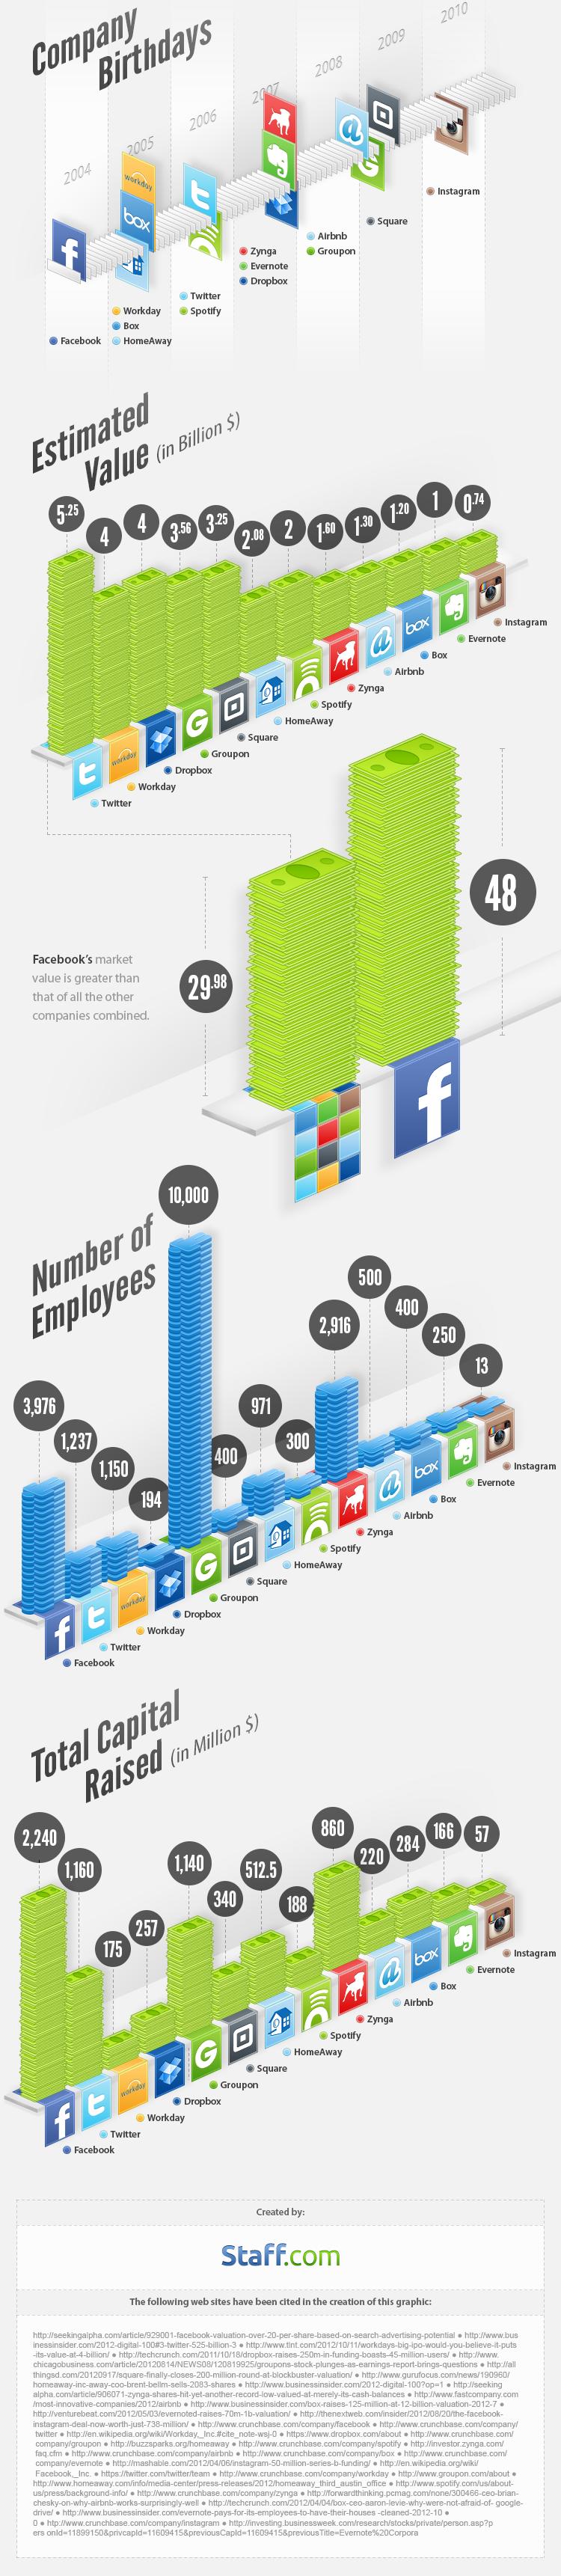 billion-dollar-startups